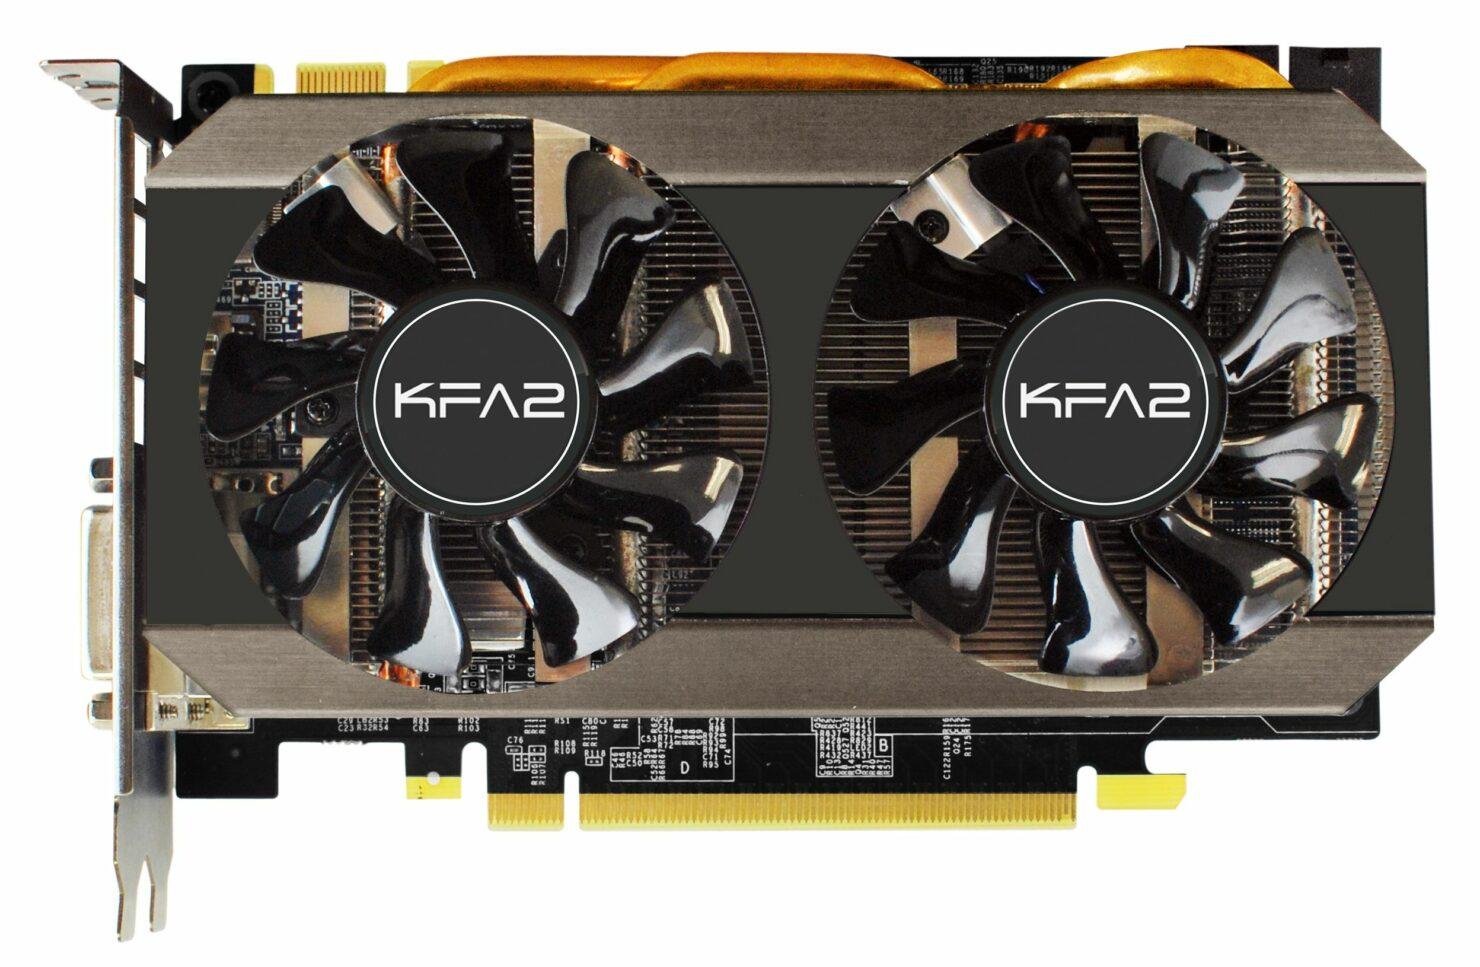 kfa2-geforce-gtx-960-oc-mini_top